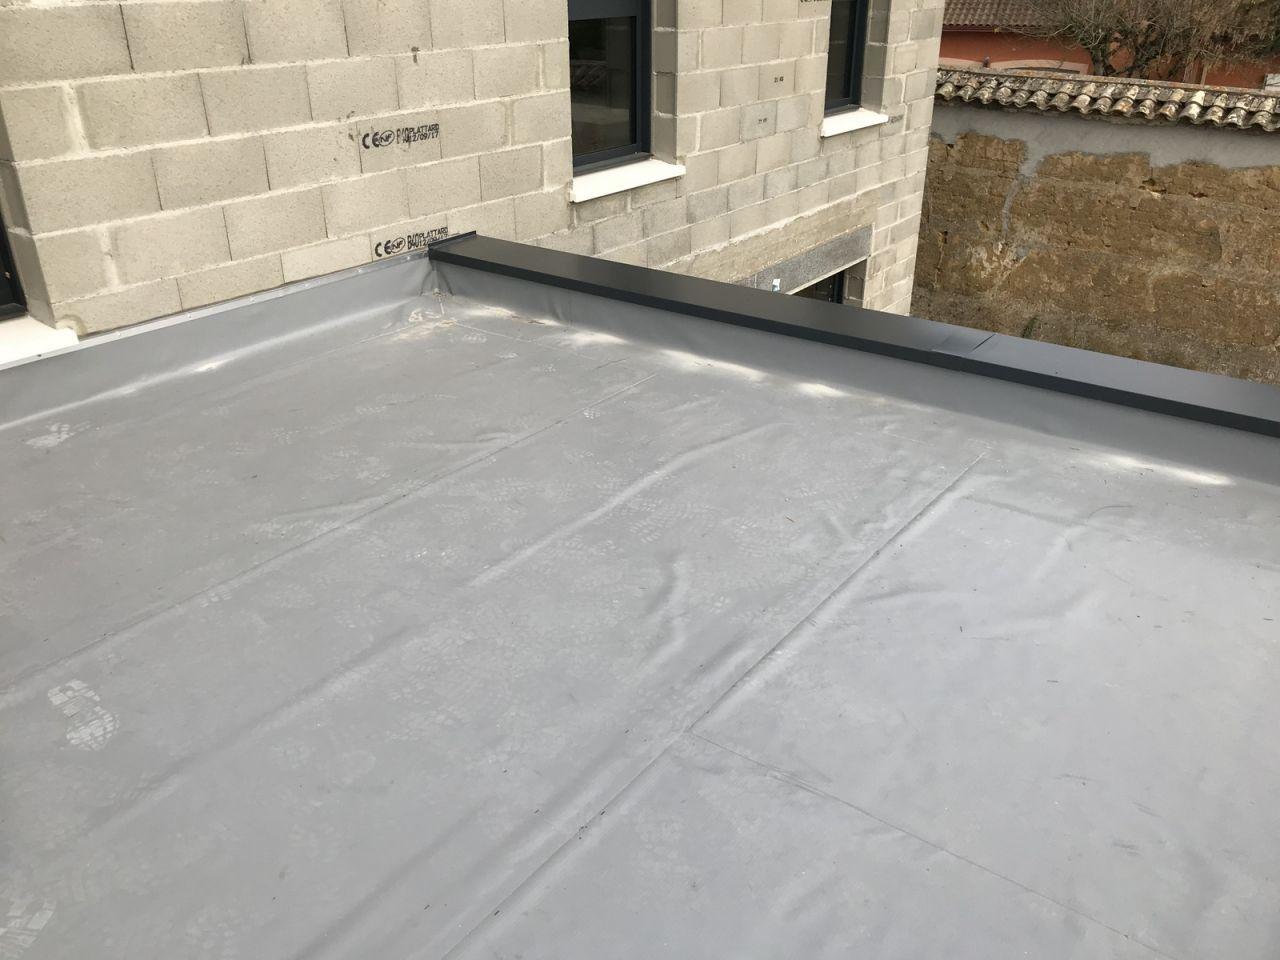 La partie en toit terrasse